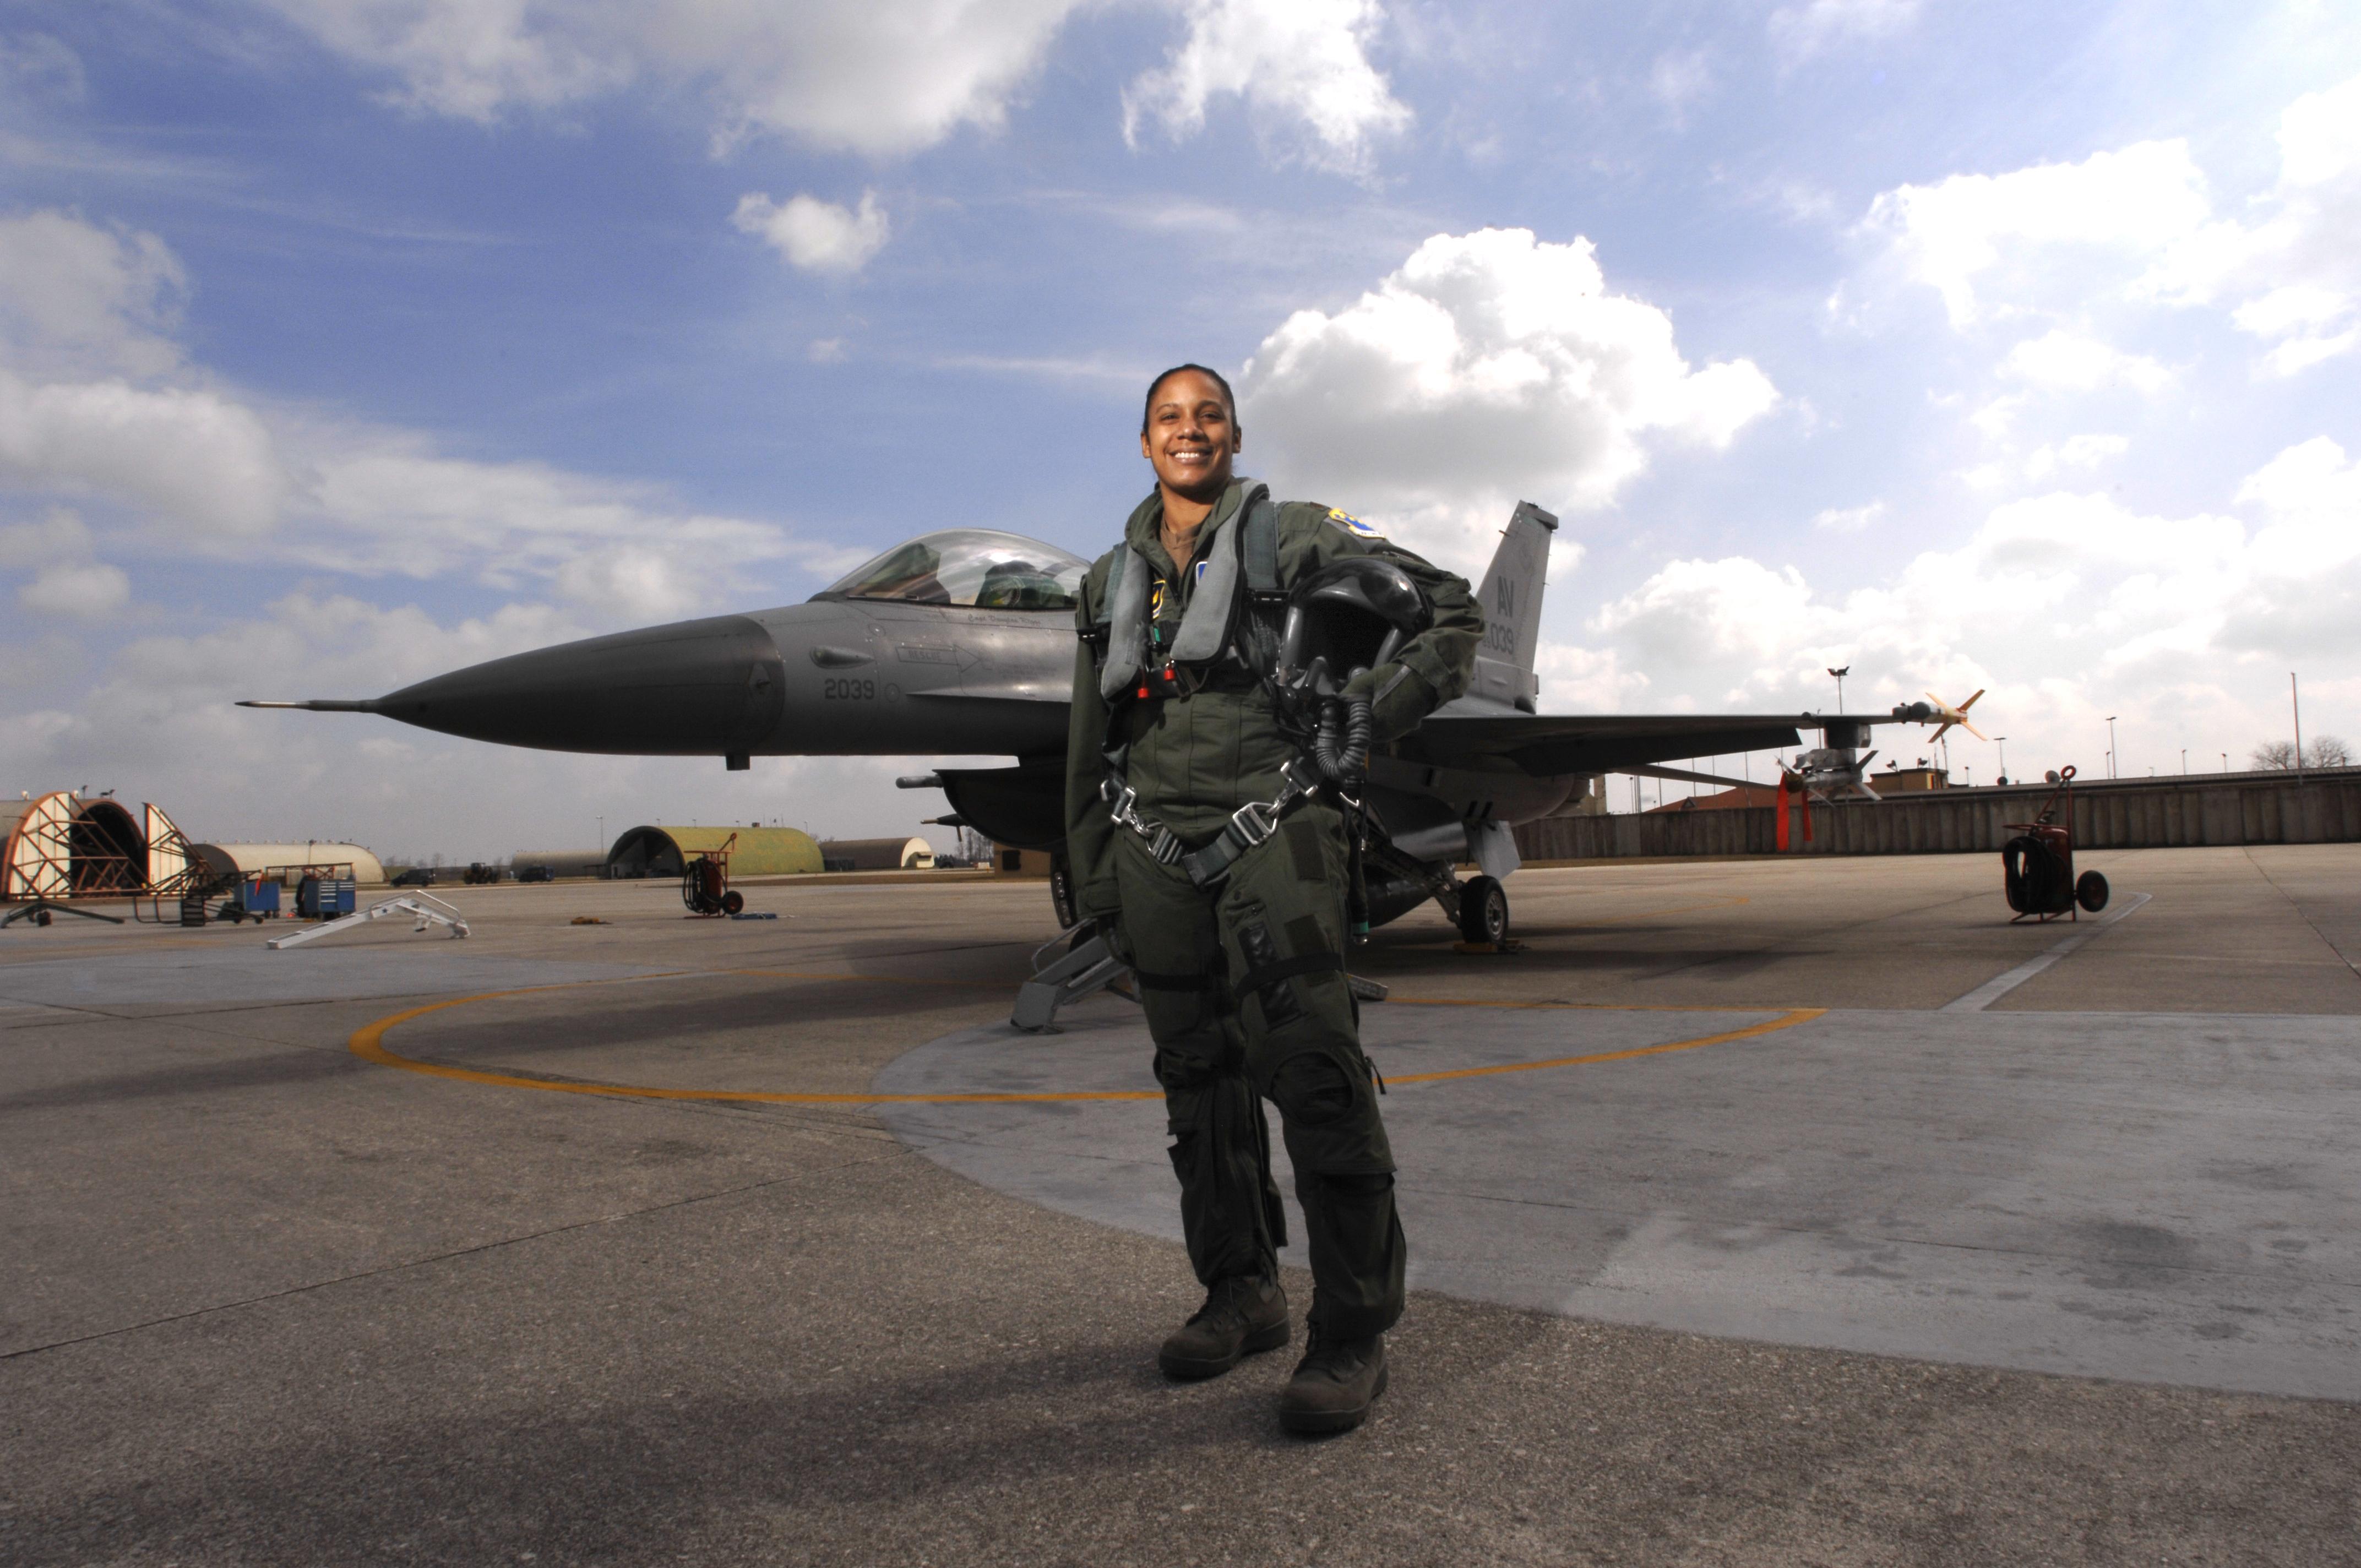 How Much Do Navy Pilots Make?